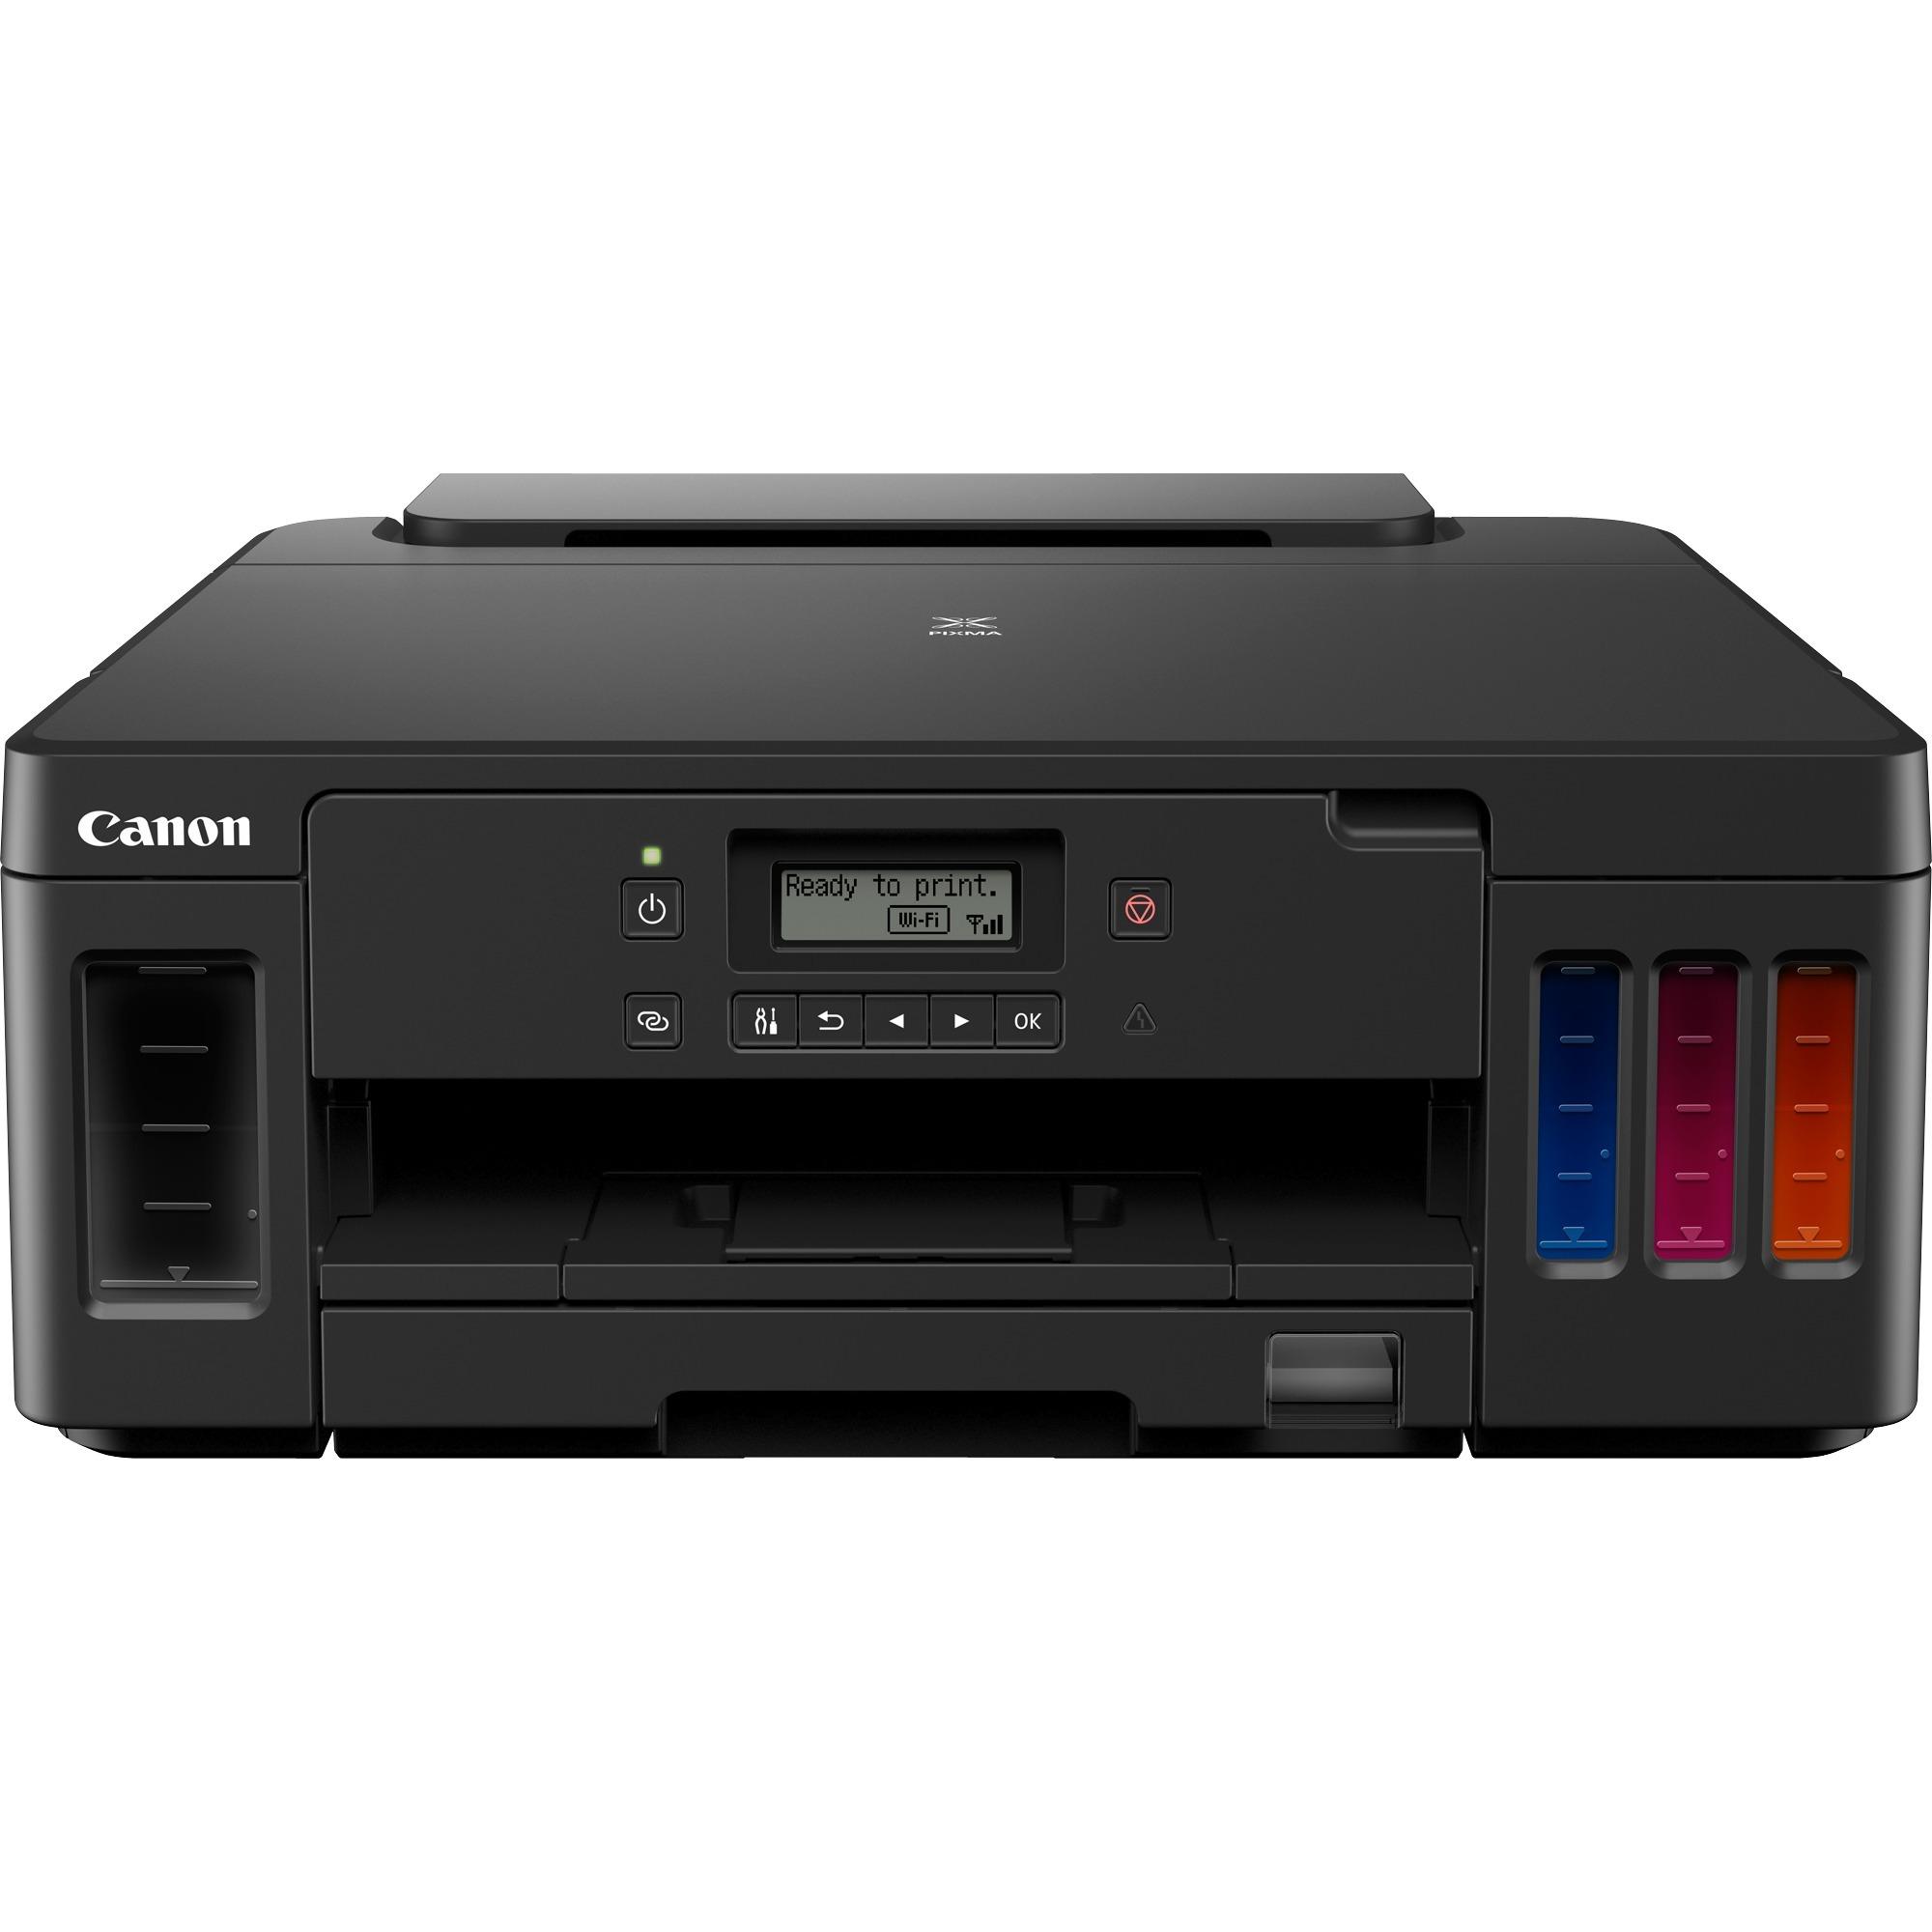 3112C006 impresora de inyección de tinta Color 4800 x 1200 DPI A5 Wifi, Impresora de chorro de tinta